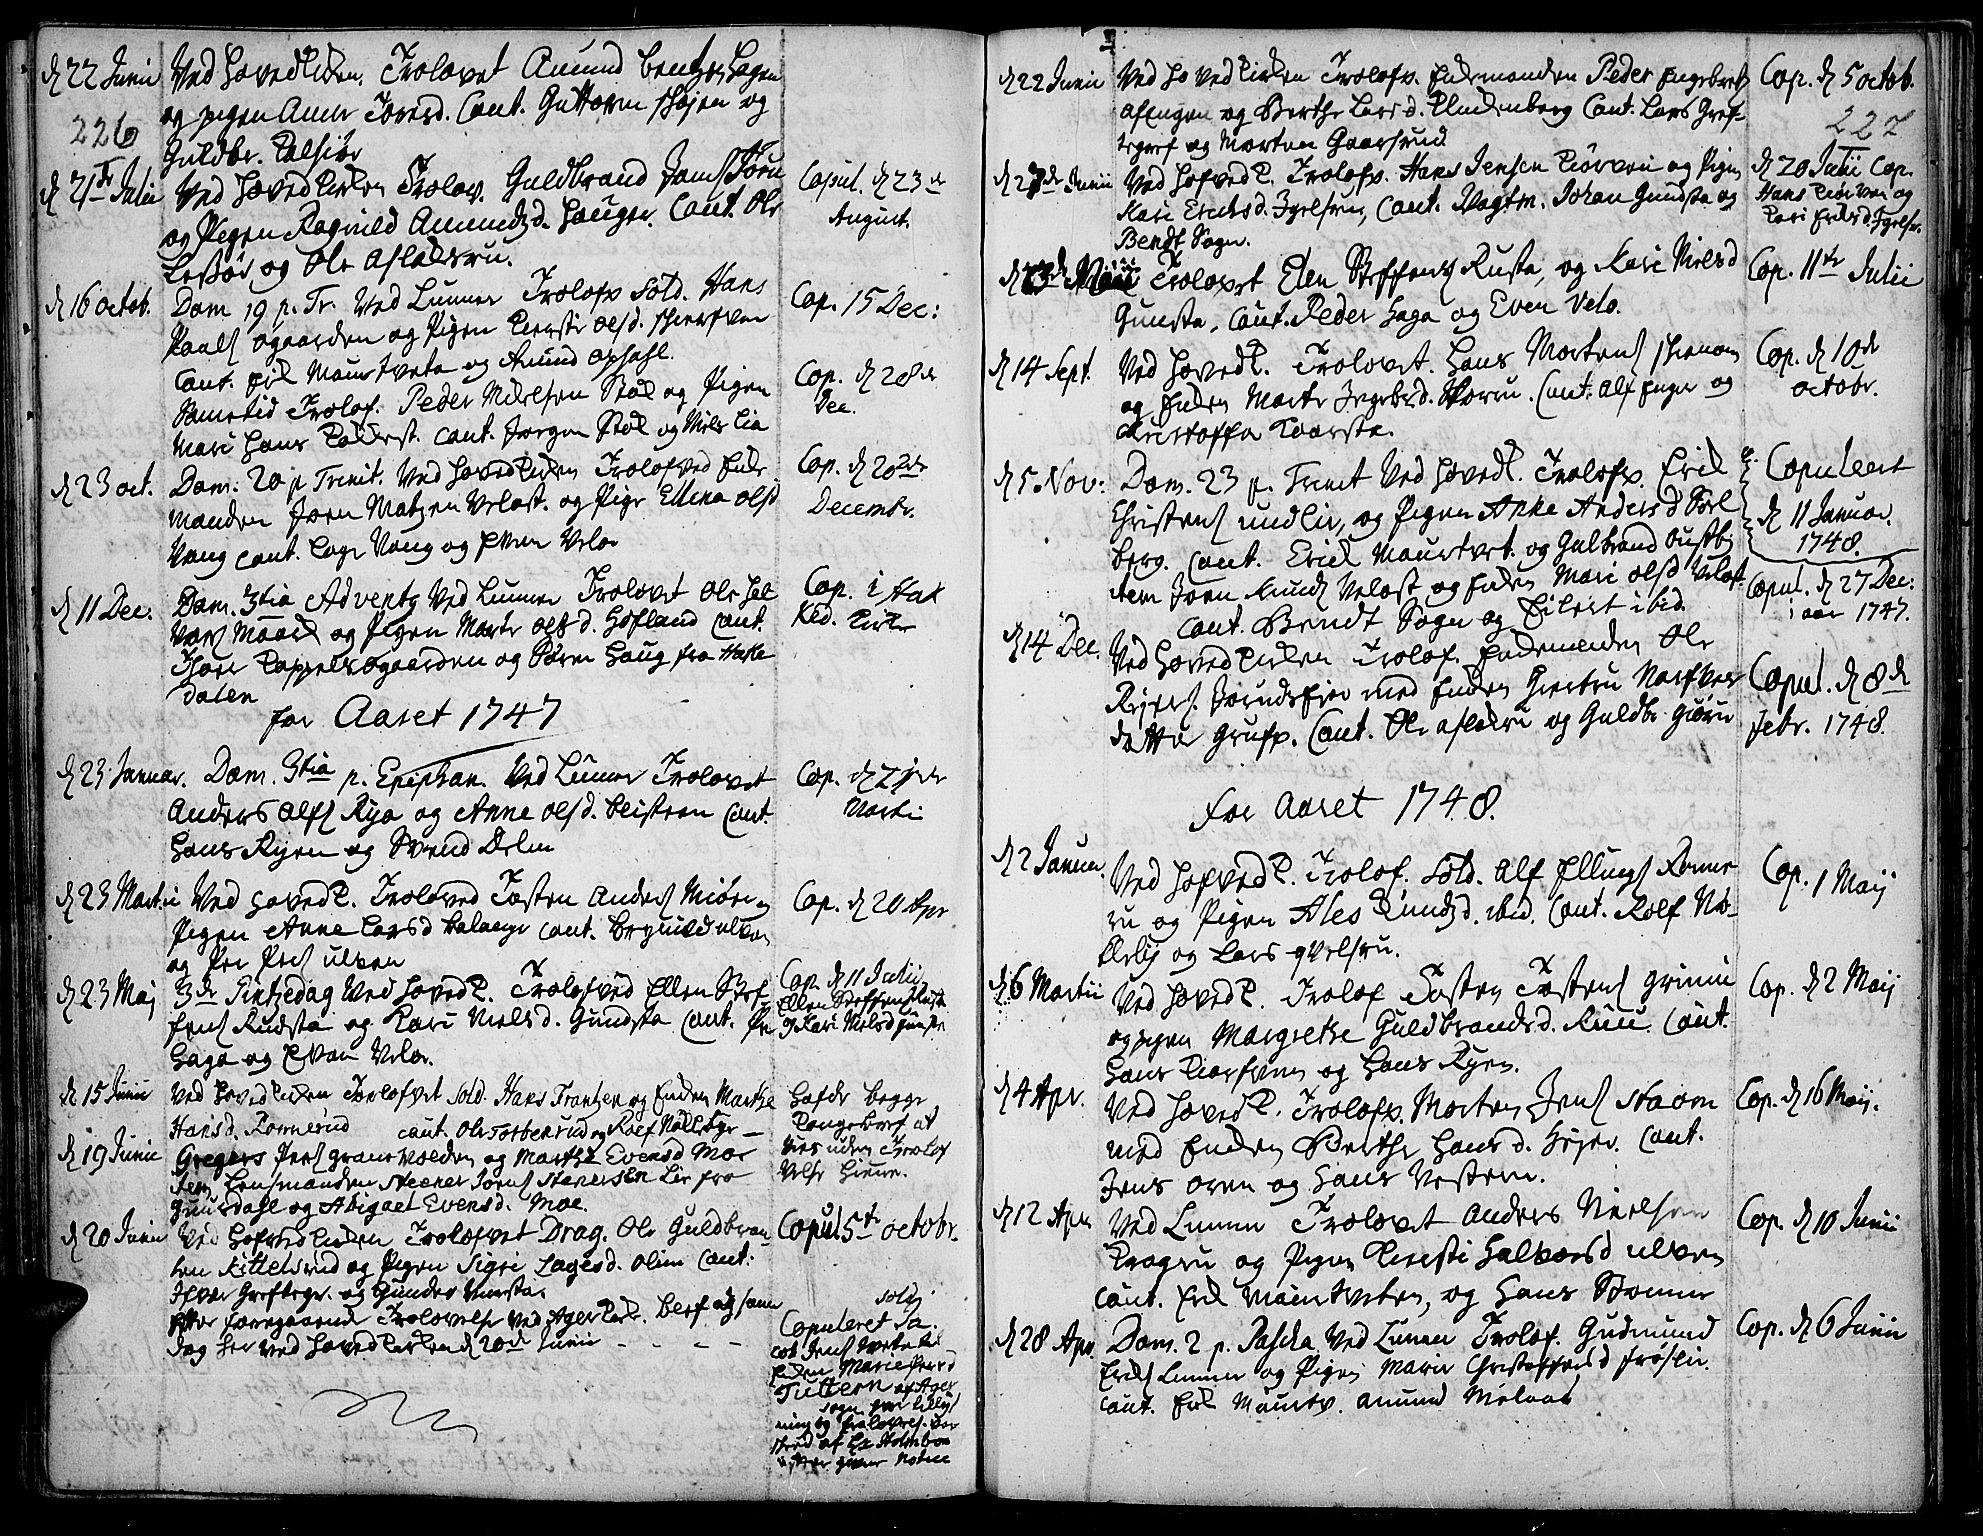 SAH, Jevnaker prestekontor, Ministerialbok nr. 2, 1725-1751, s. 226-227